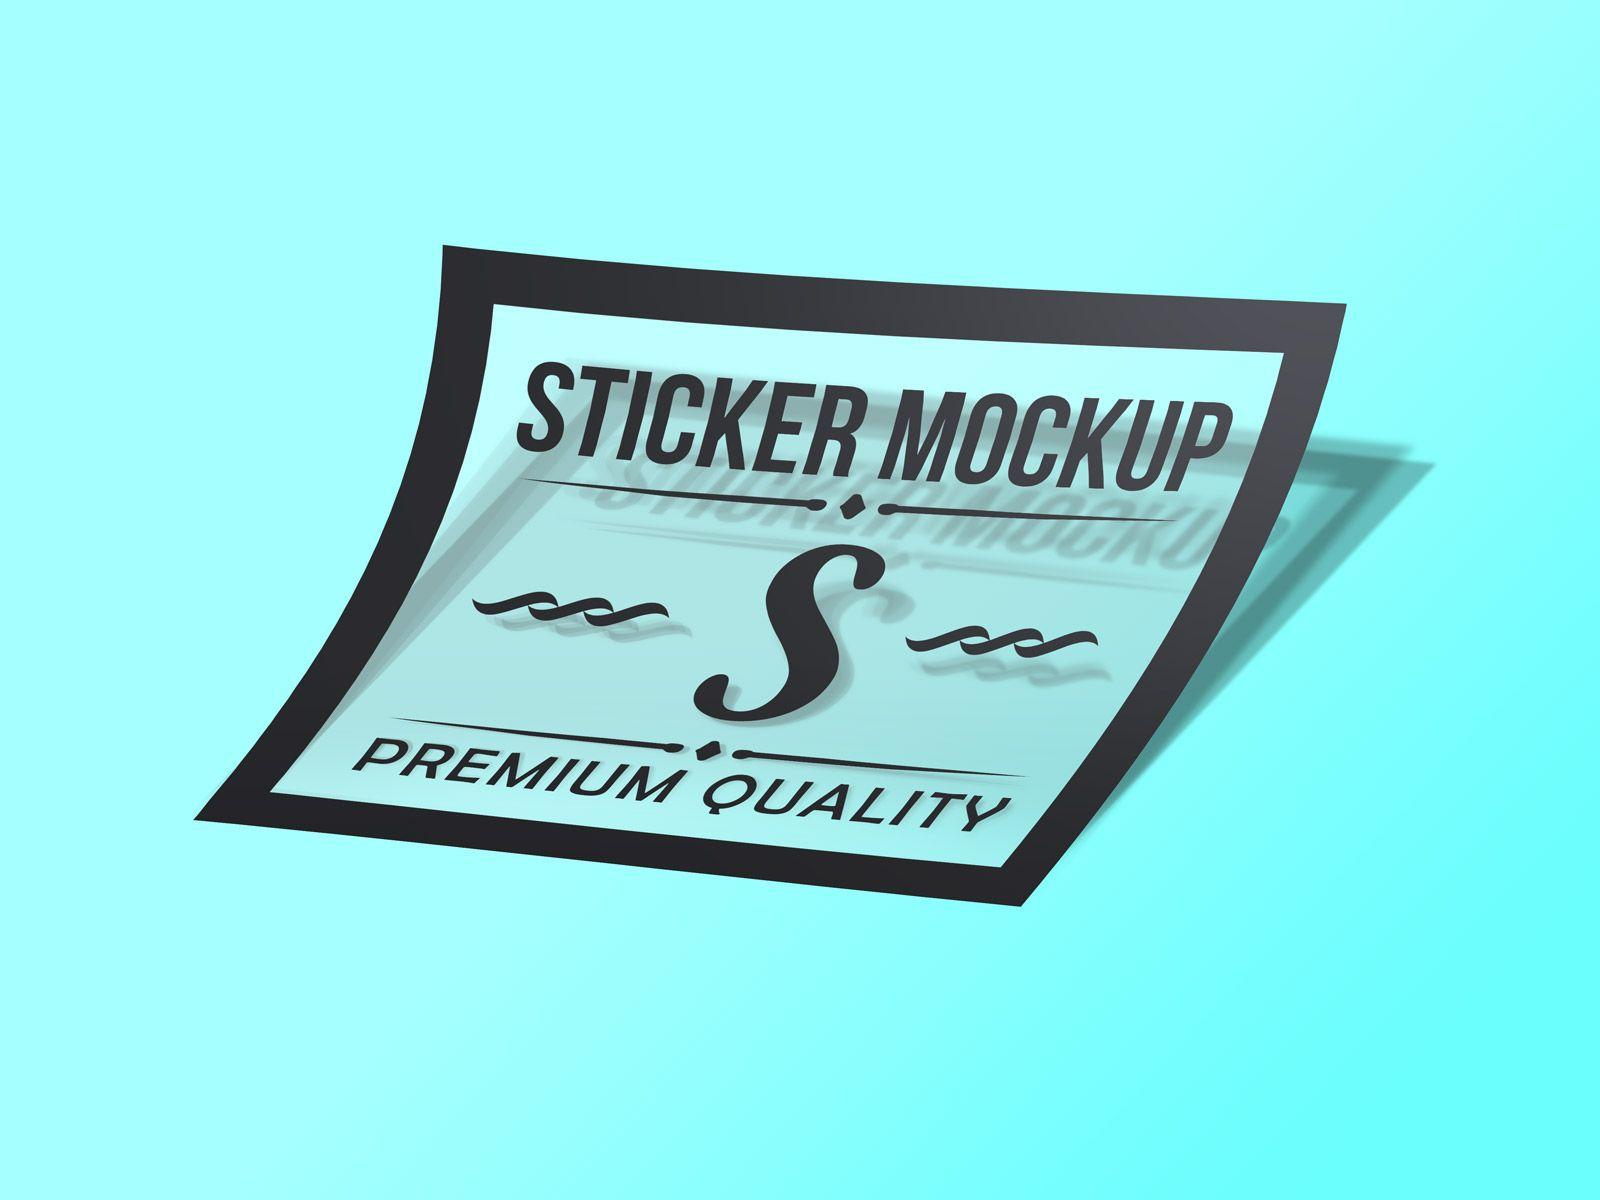 Free Photorealistic Transparent Sticker Mockup Psd Good Mockups Transparent Stickers Mockup Psd Mockup